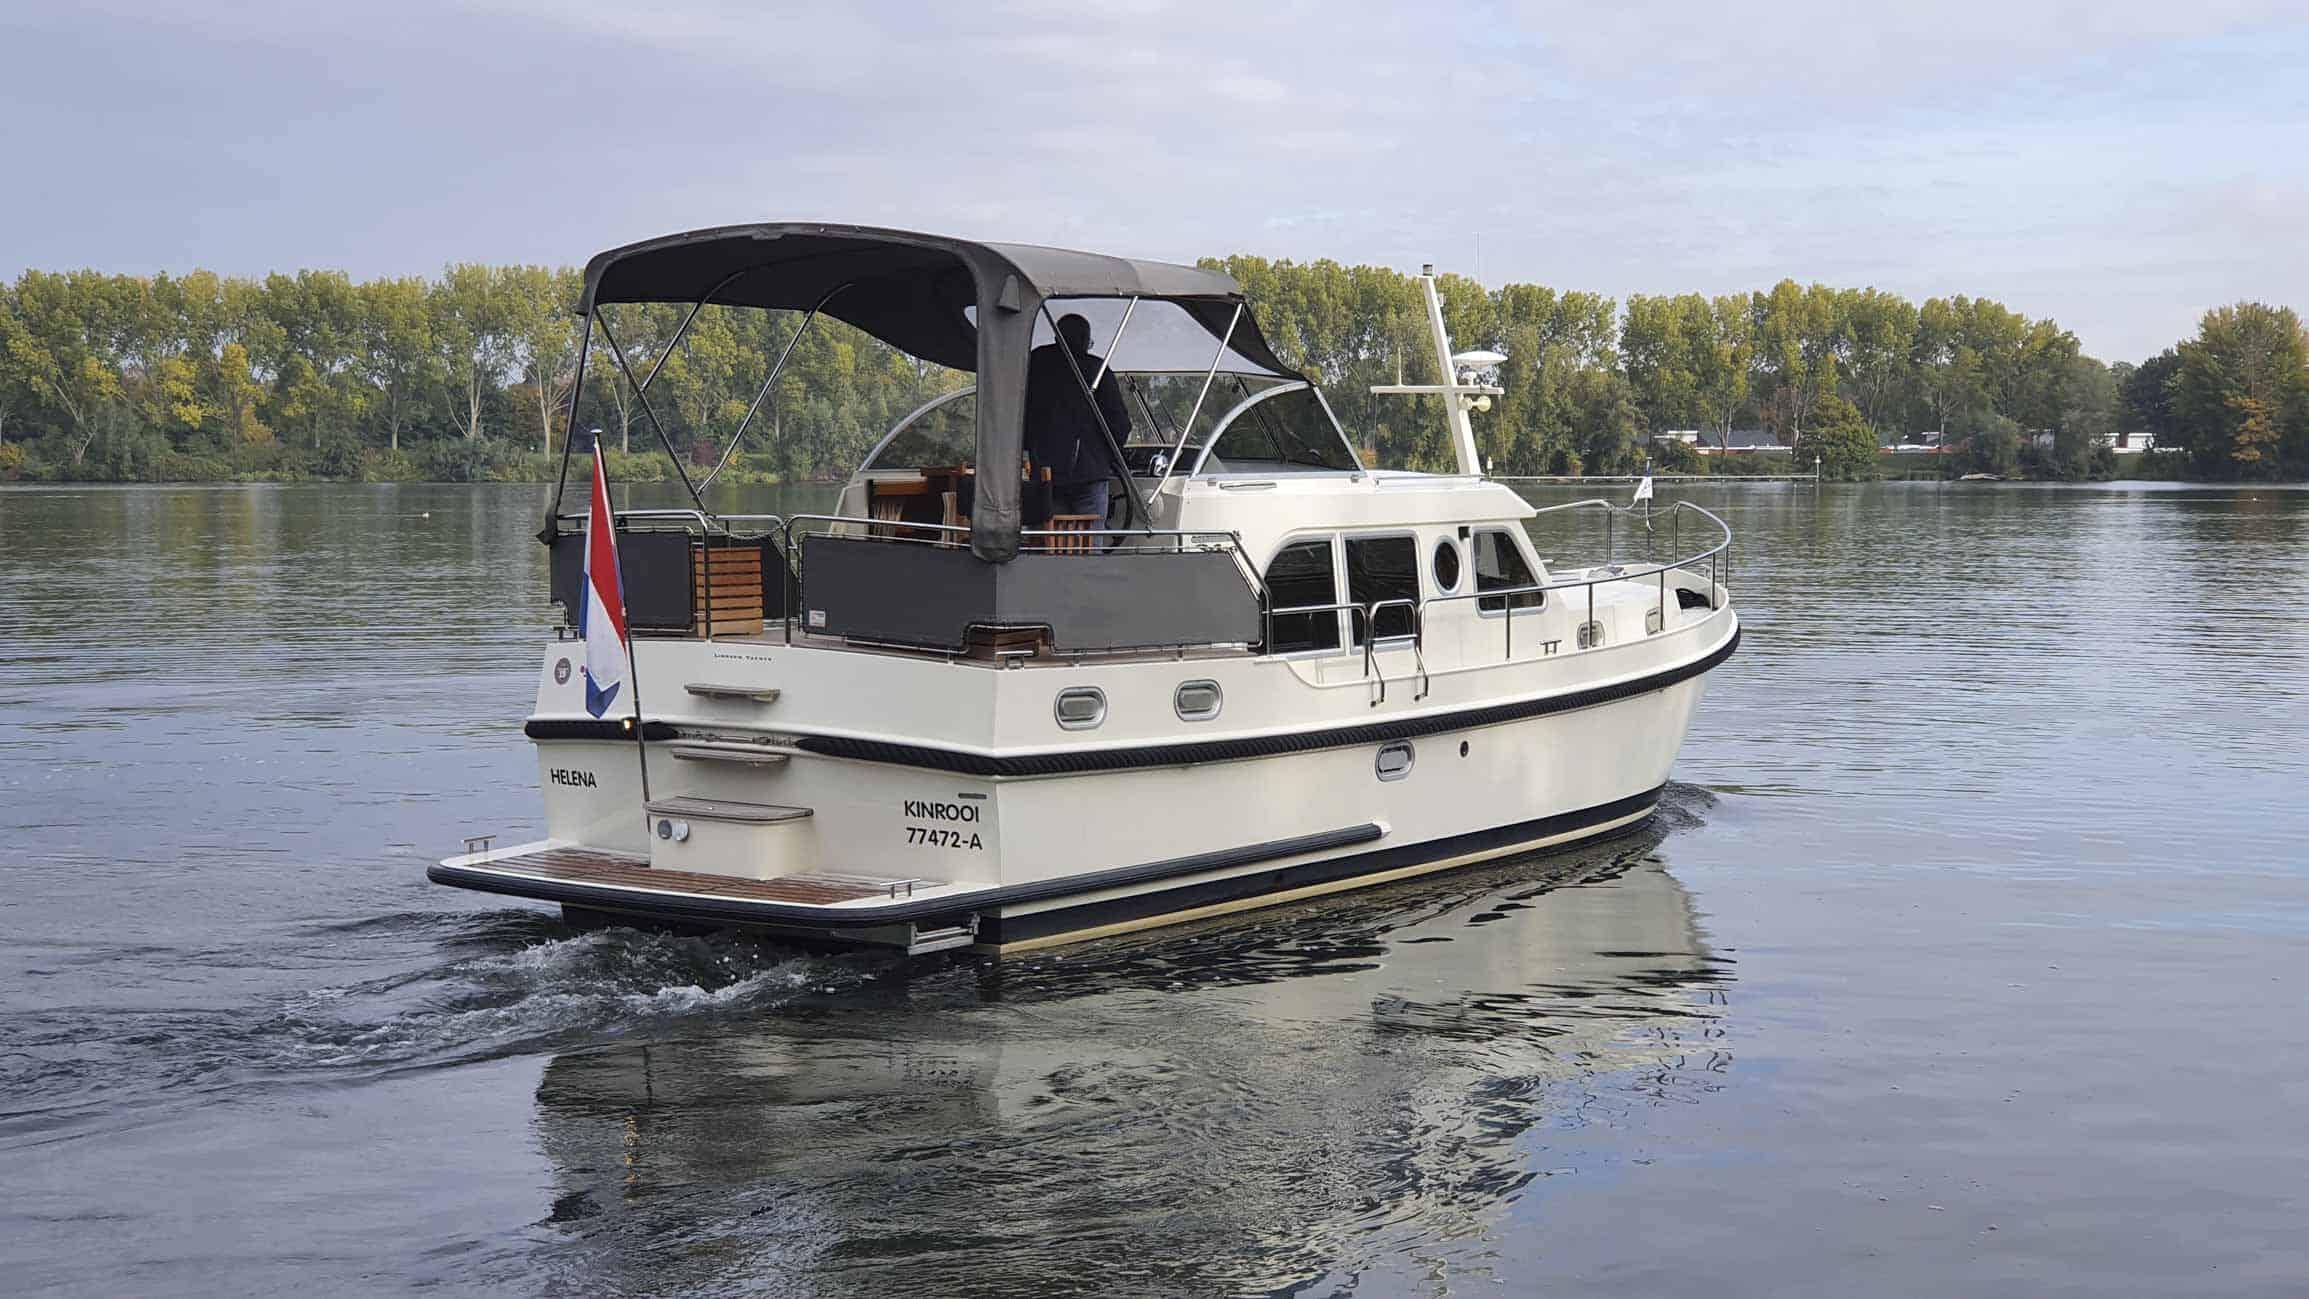 gebruikt-motorjacht-grand-sturdy-34-9-ac-3115-005